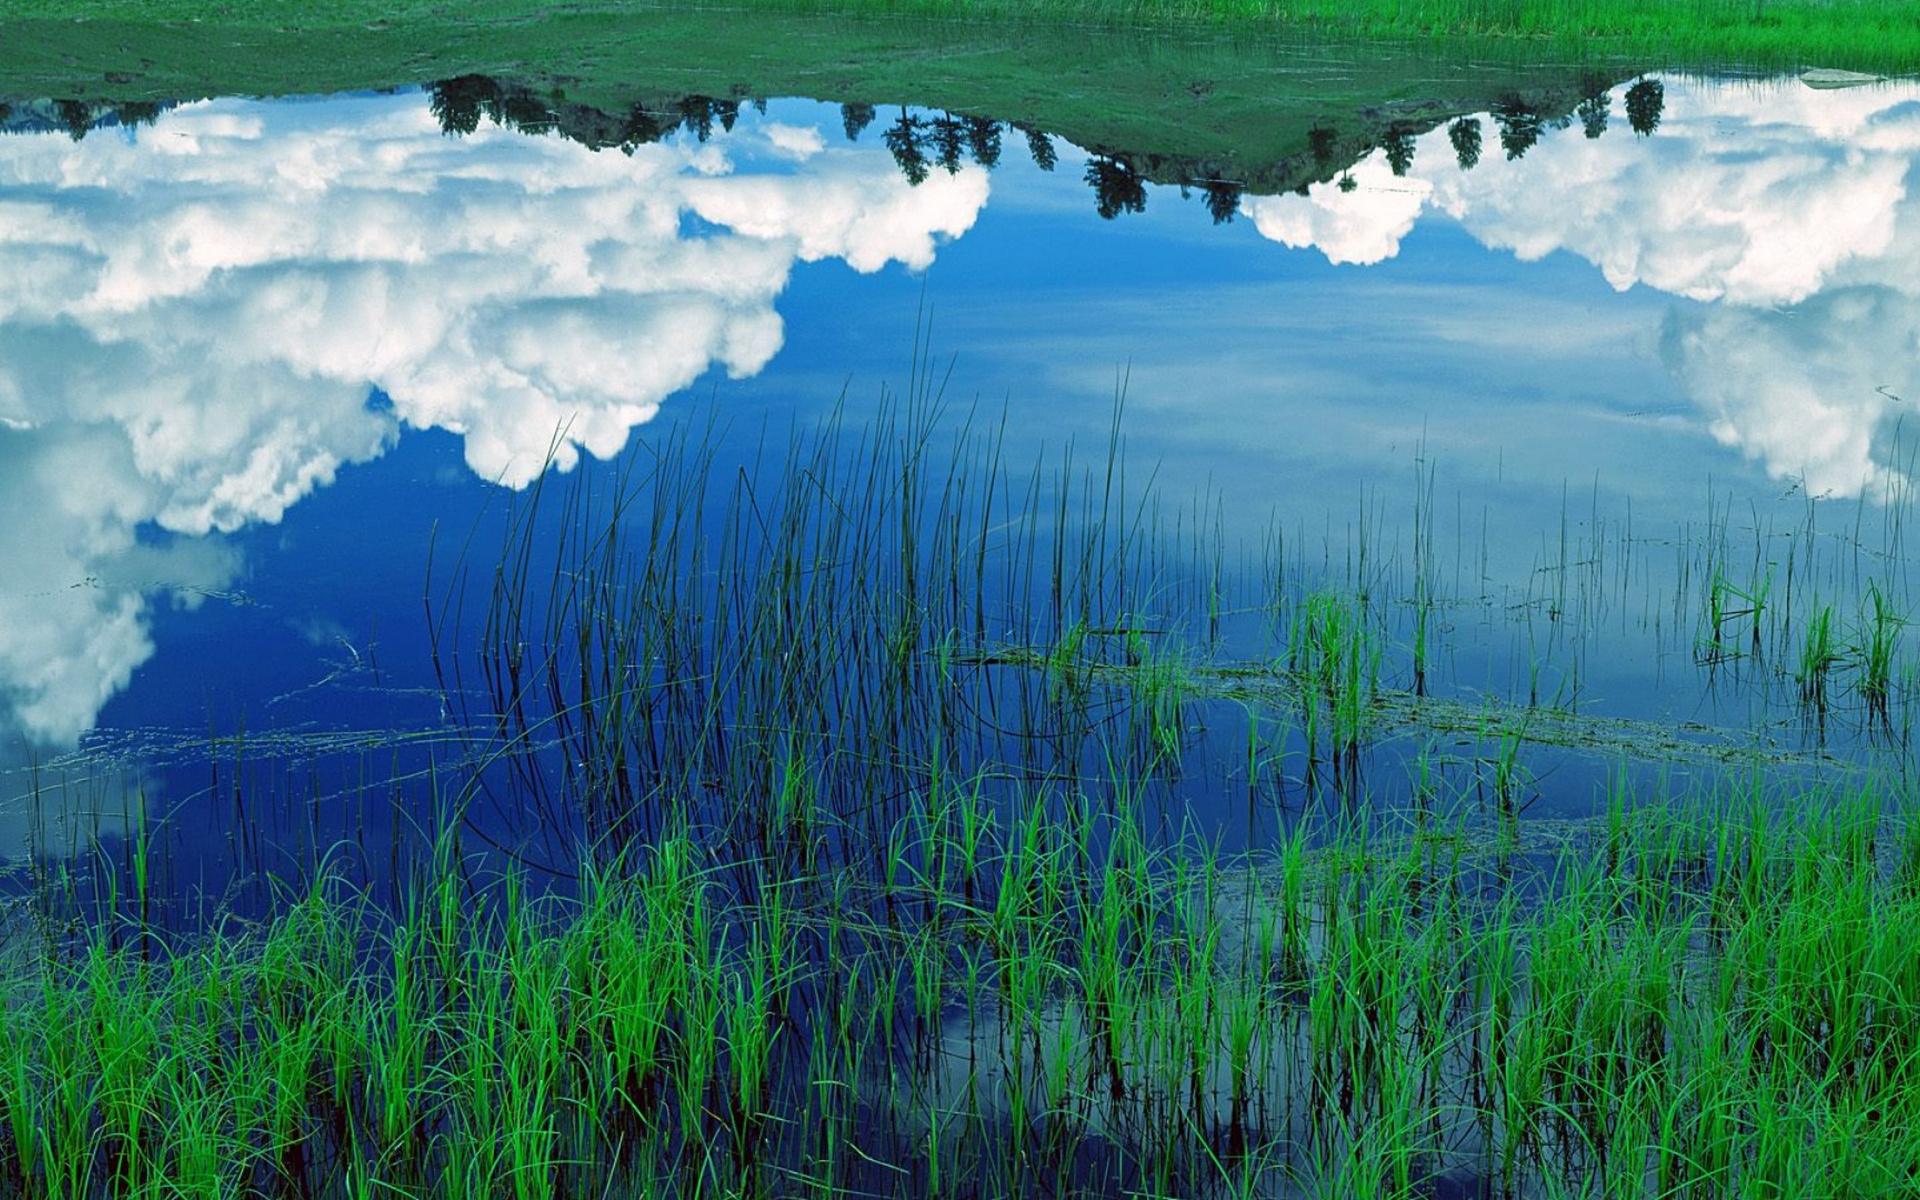 Облака, трава, цветы, озеро  № 1963148 бесплатно